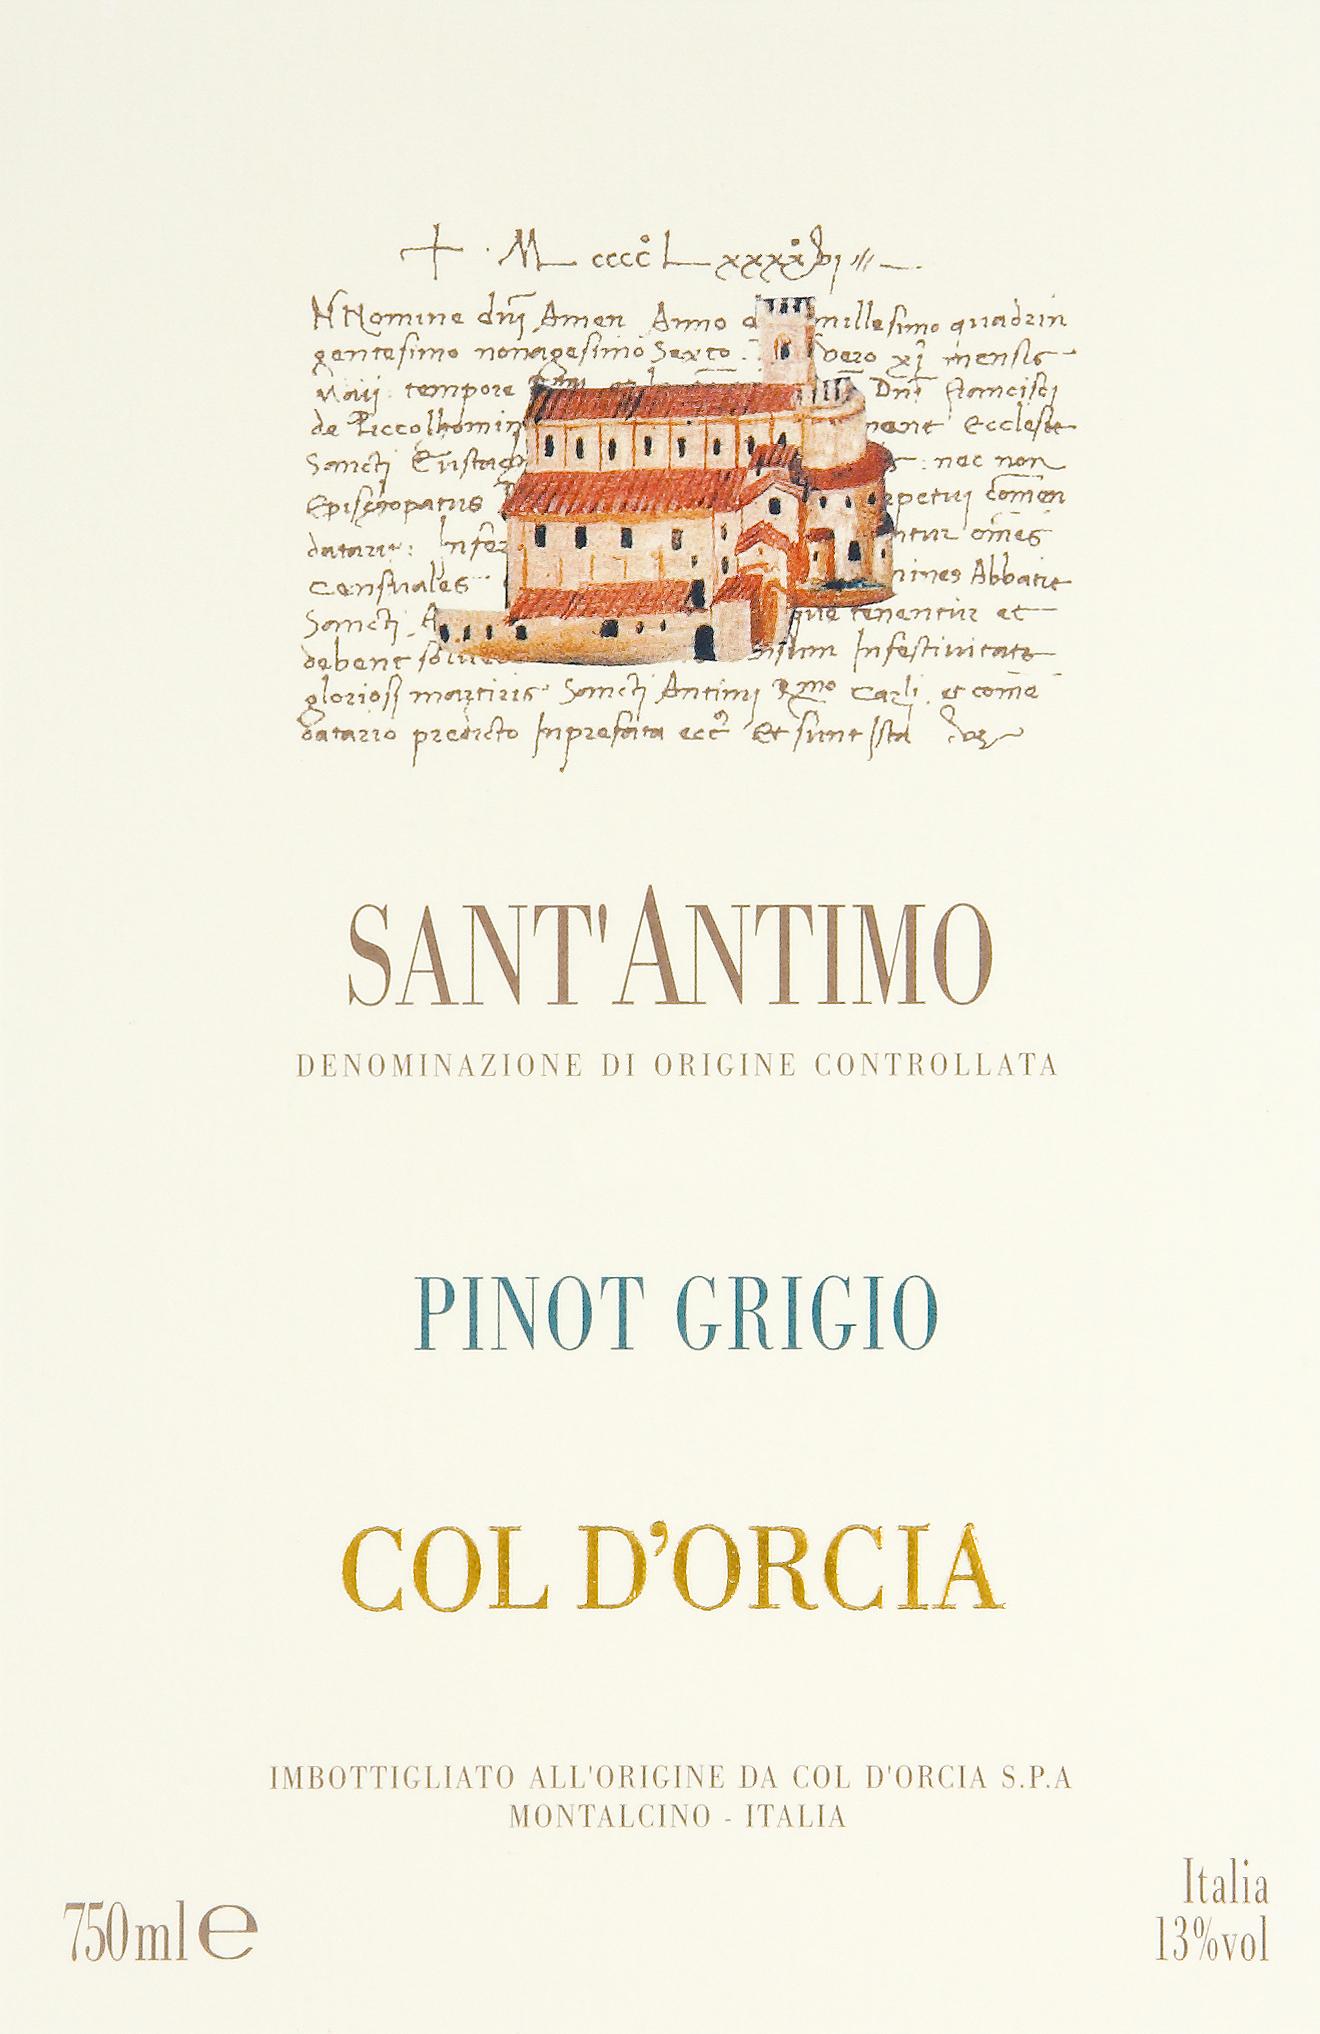 科尔多奇亚圣安蒂莫灰皮诺干白Col d'Orcia Pinot Grigio Sant'Antimo